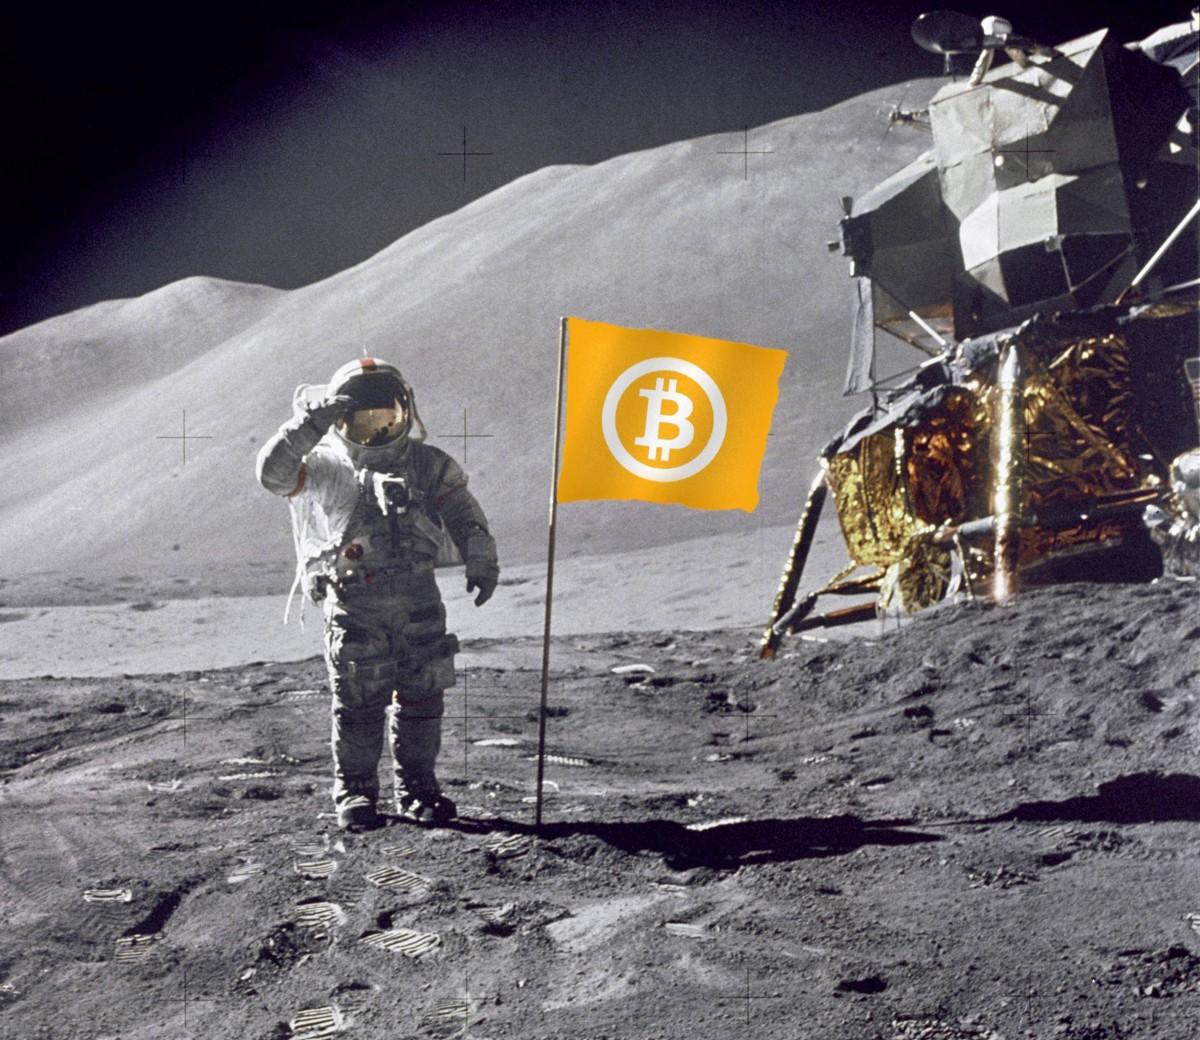 Bitcoin Kisa Zamanda 20.000 Dolari Asacak Populer Isimden Iddiali Aciklama